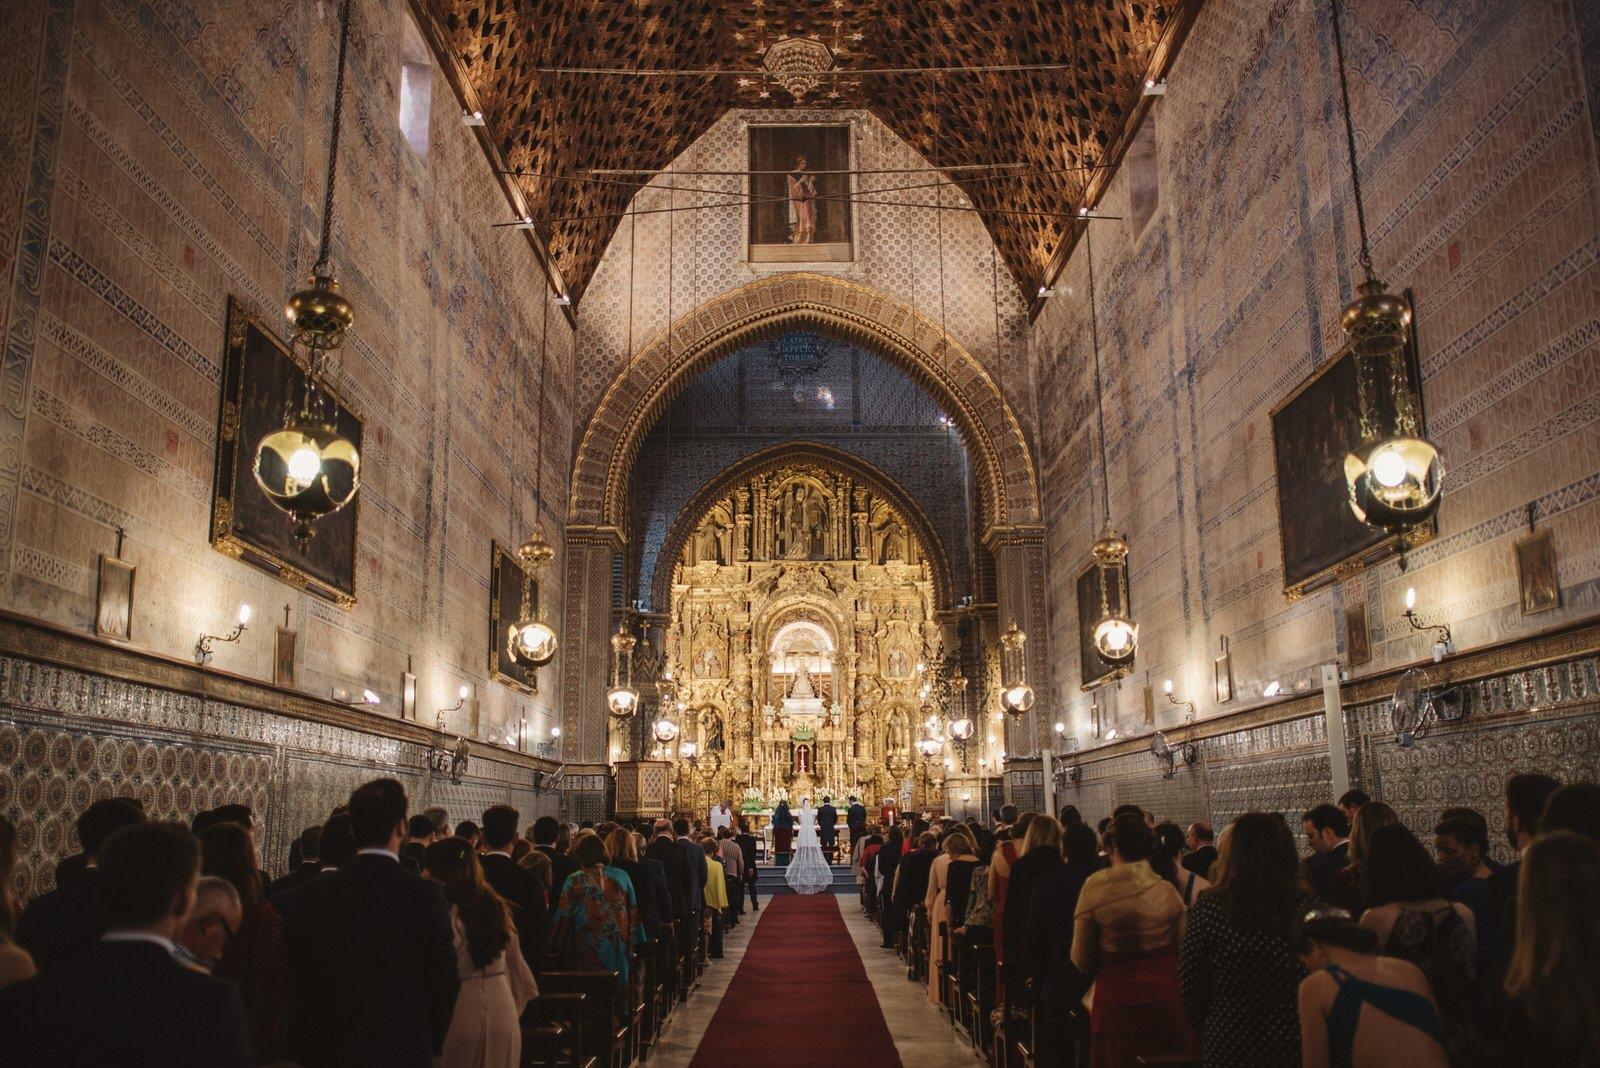 fotografo de bodas sevilla - fotografo boda - fotografía sevilla - Andrés AmarilloAAA_3002-2- fine.JPG